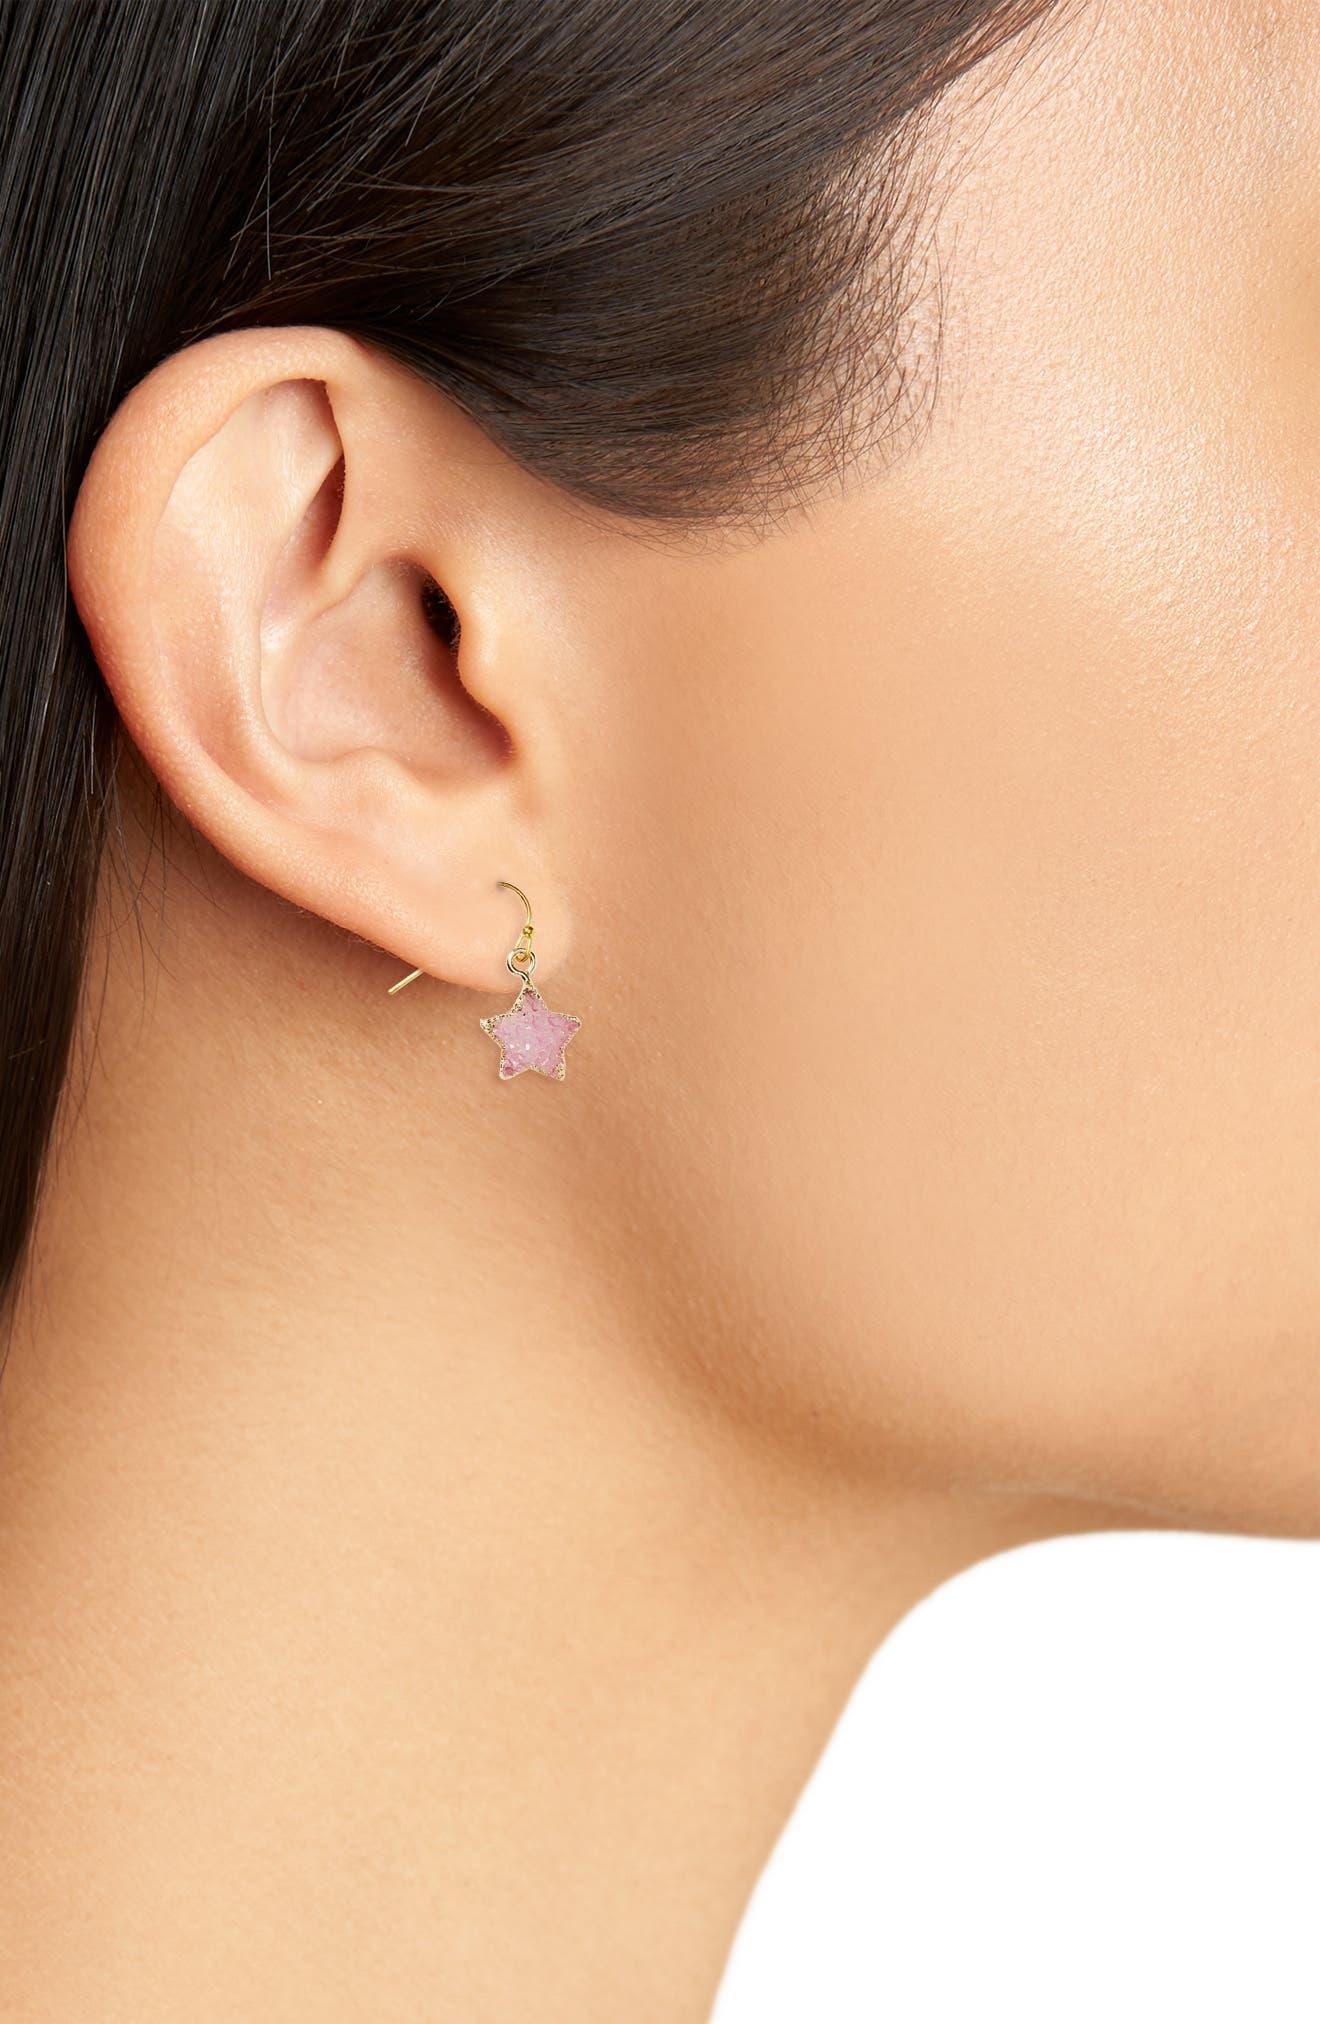 Moon & Star Drusy Stone Earrings,                             Alternate thumbnail 2, color,                             670